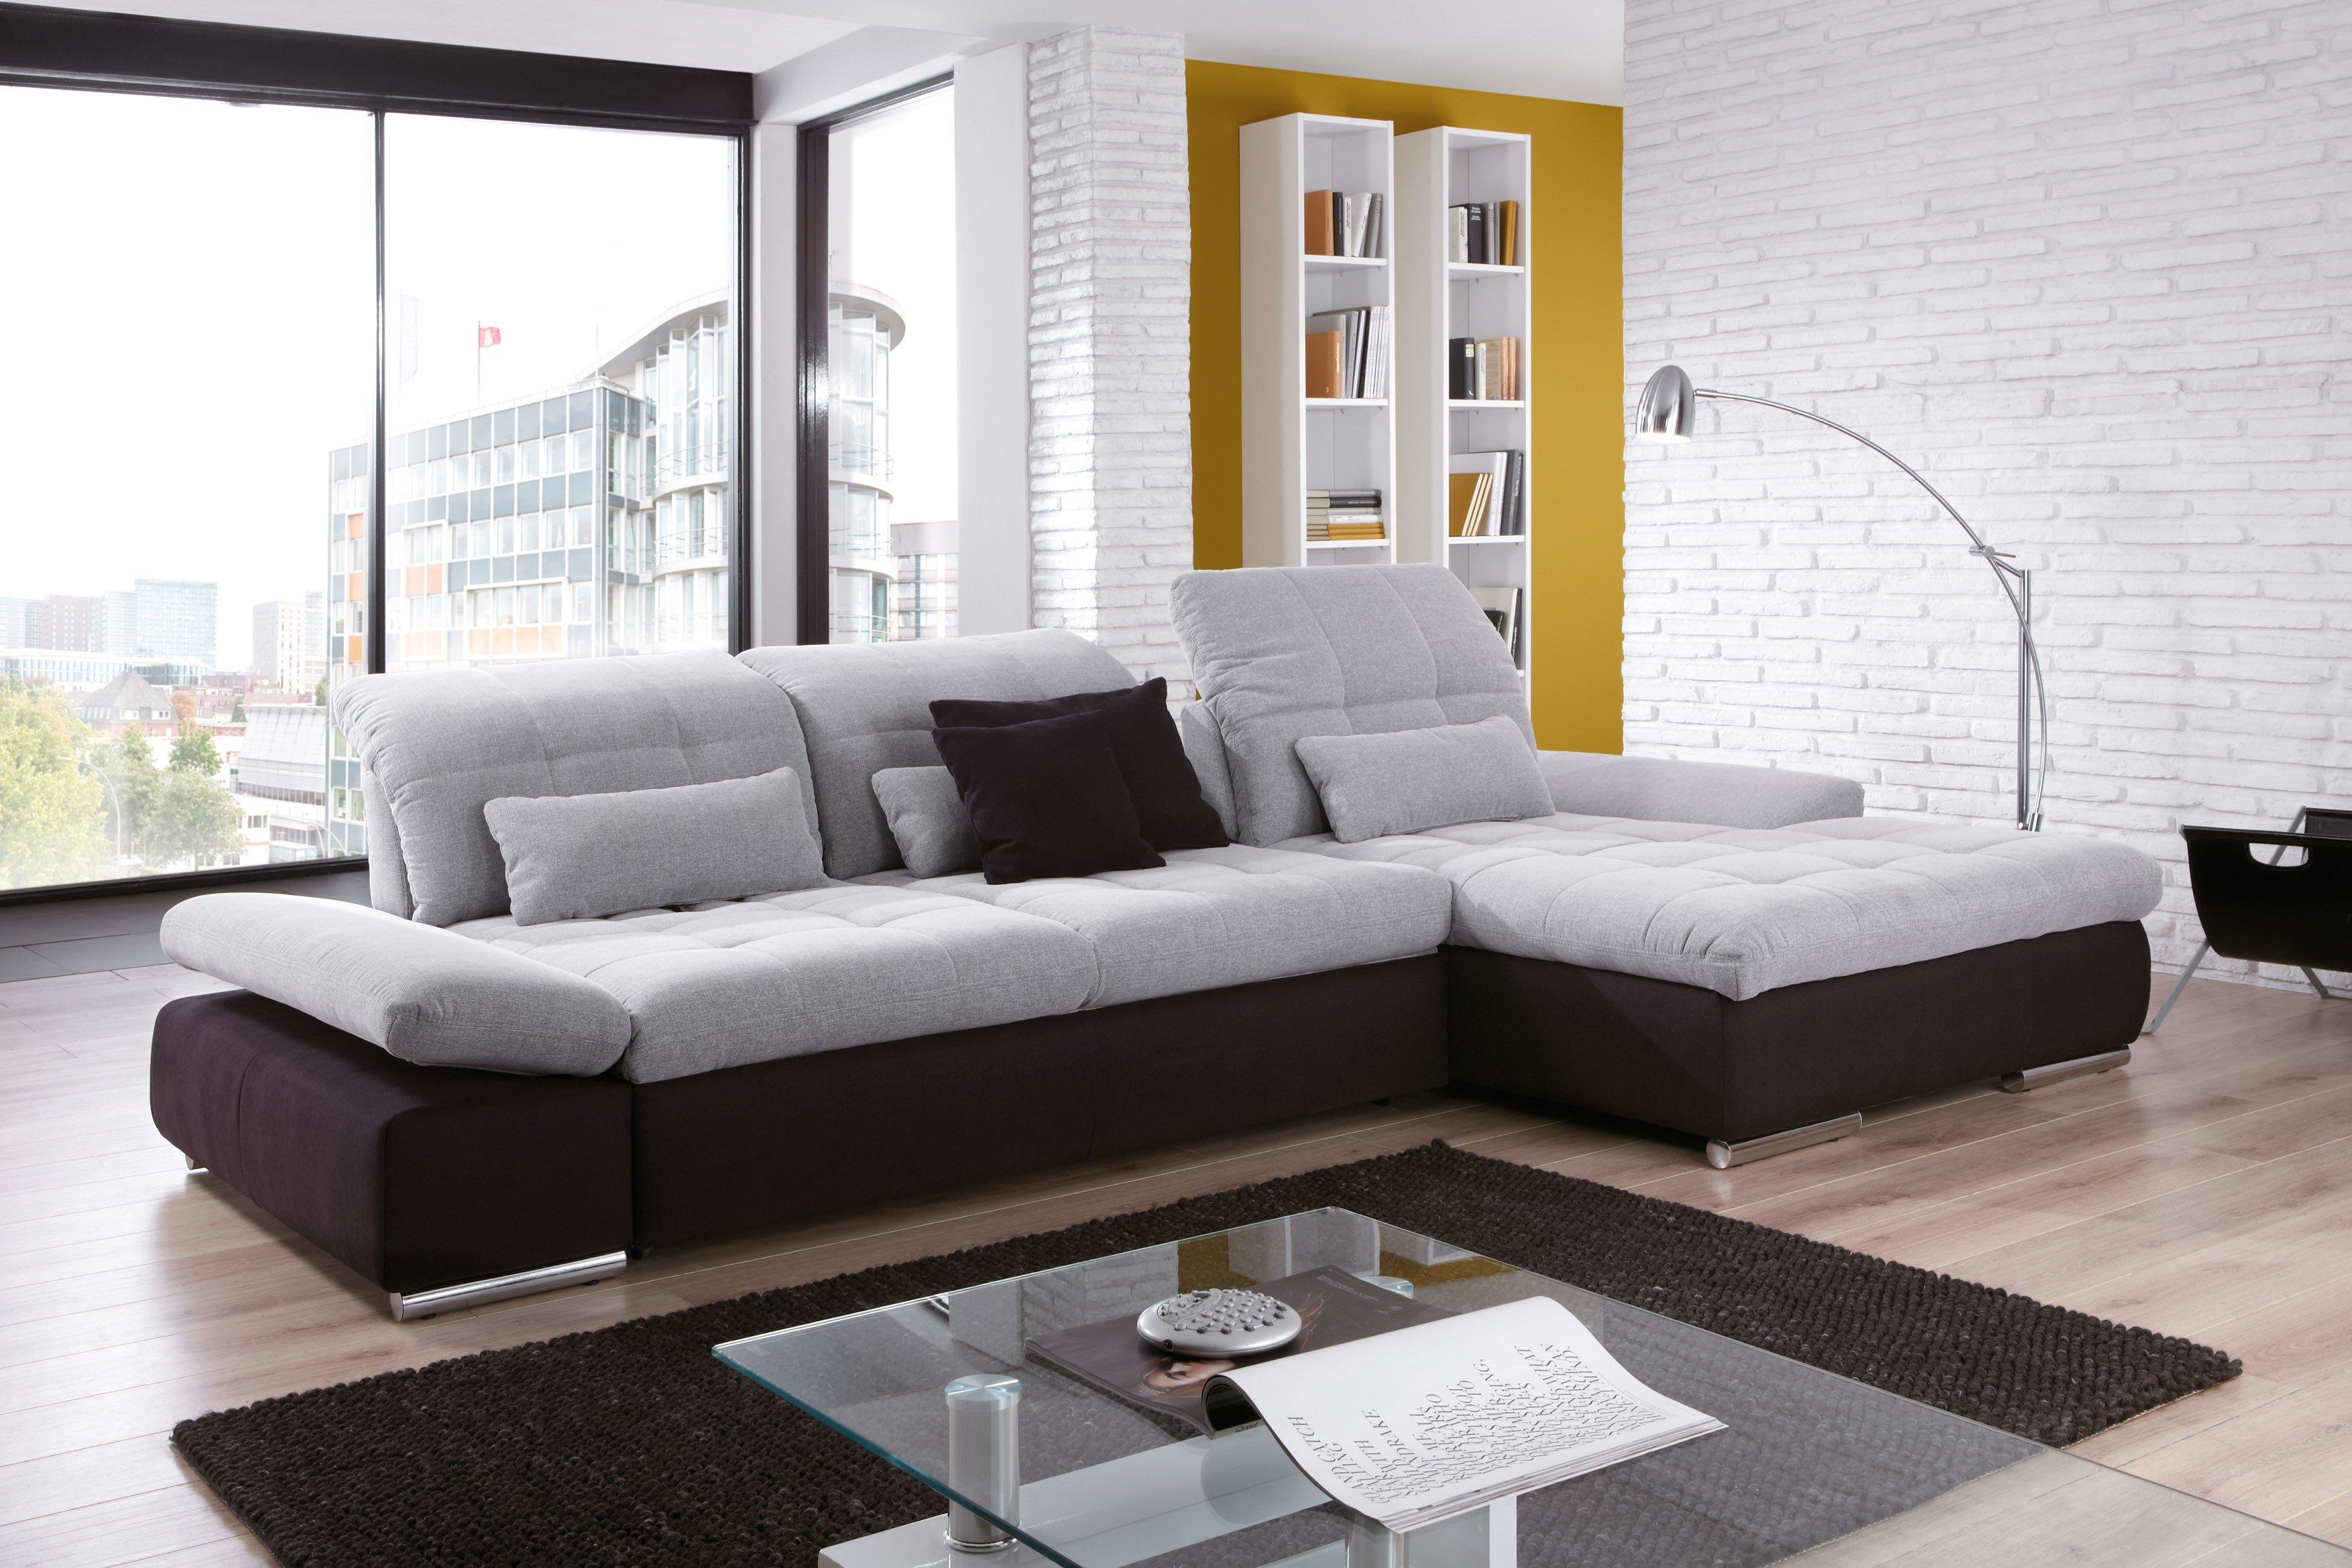 poco polsterm bel santa fe ecksofa in hellgrau schwarz m bel letz ihr online shop. Black Bedroom Furniture Sets. Home Design Ideas